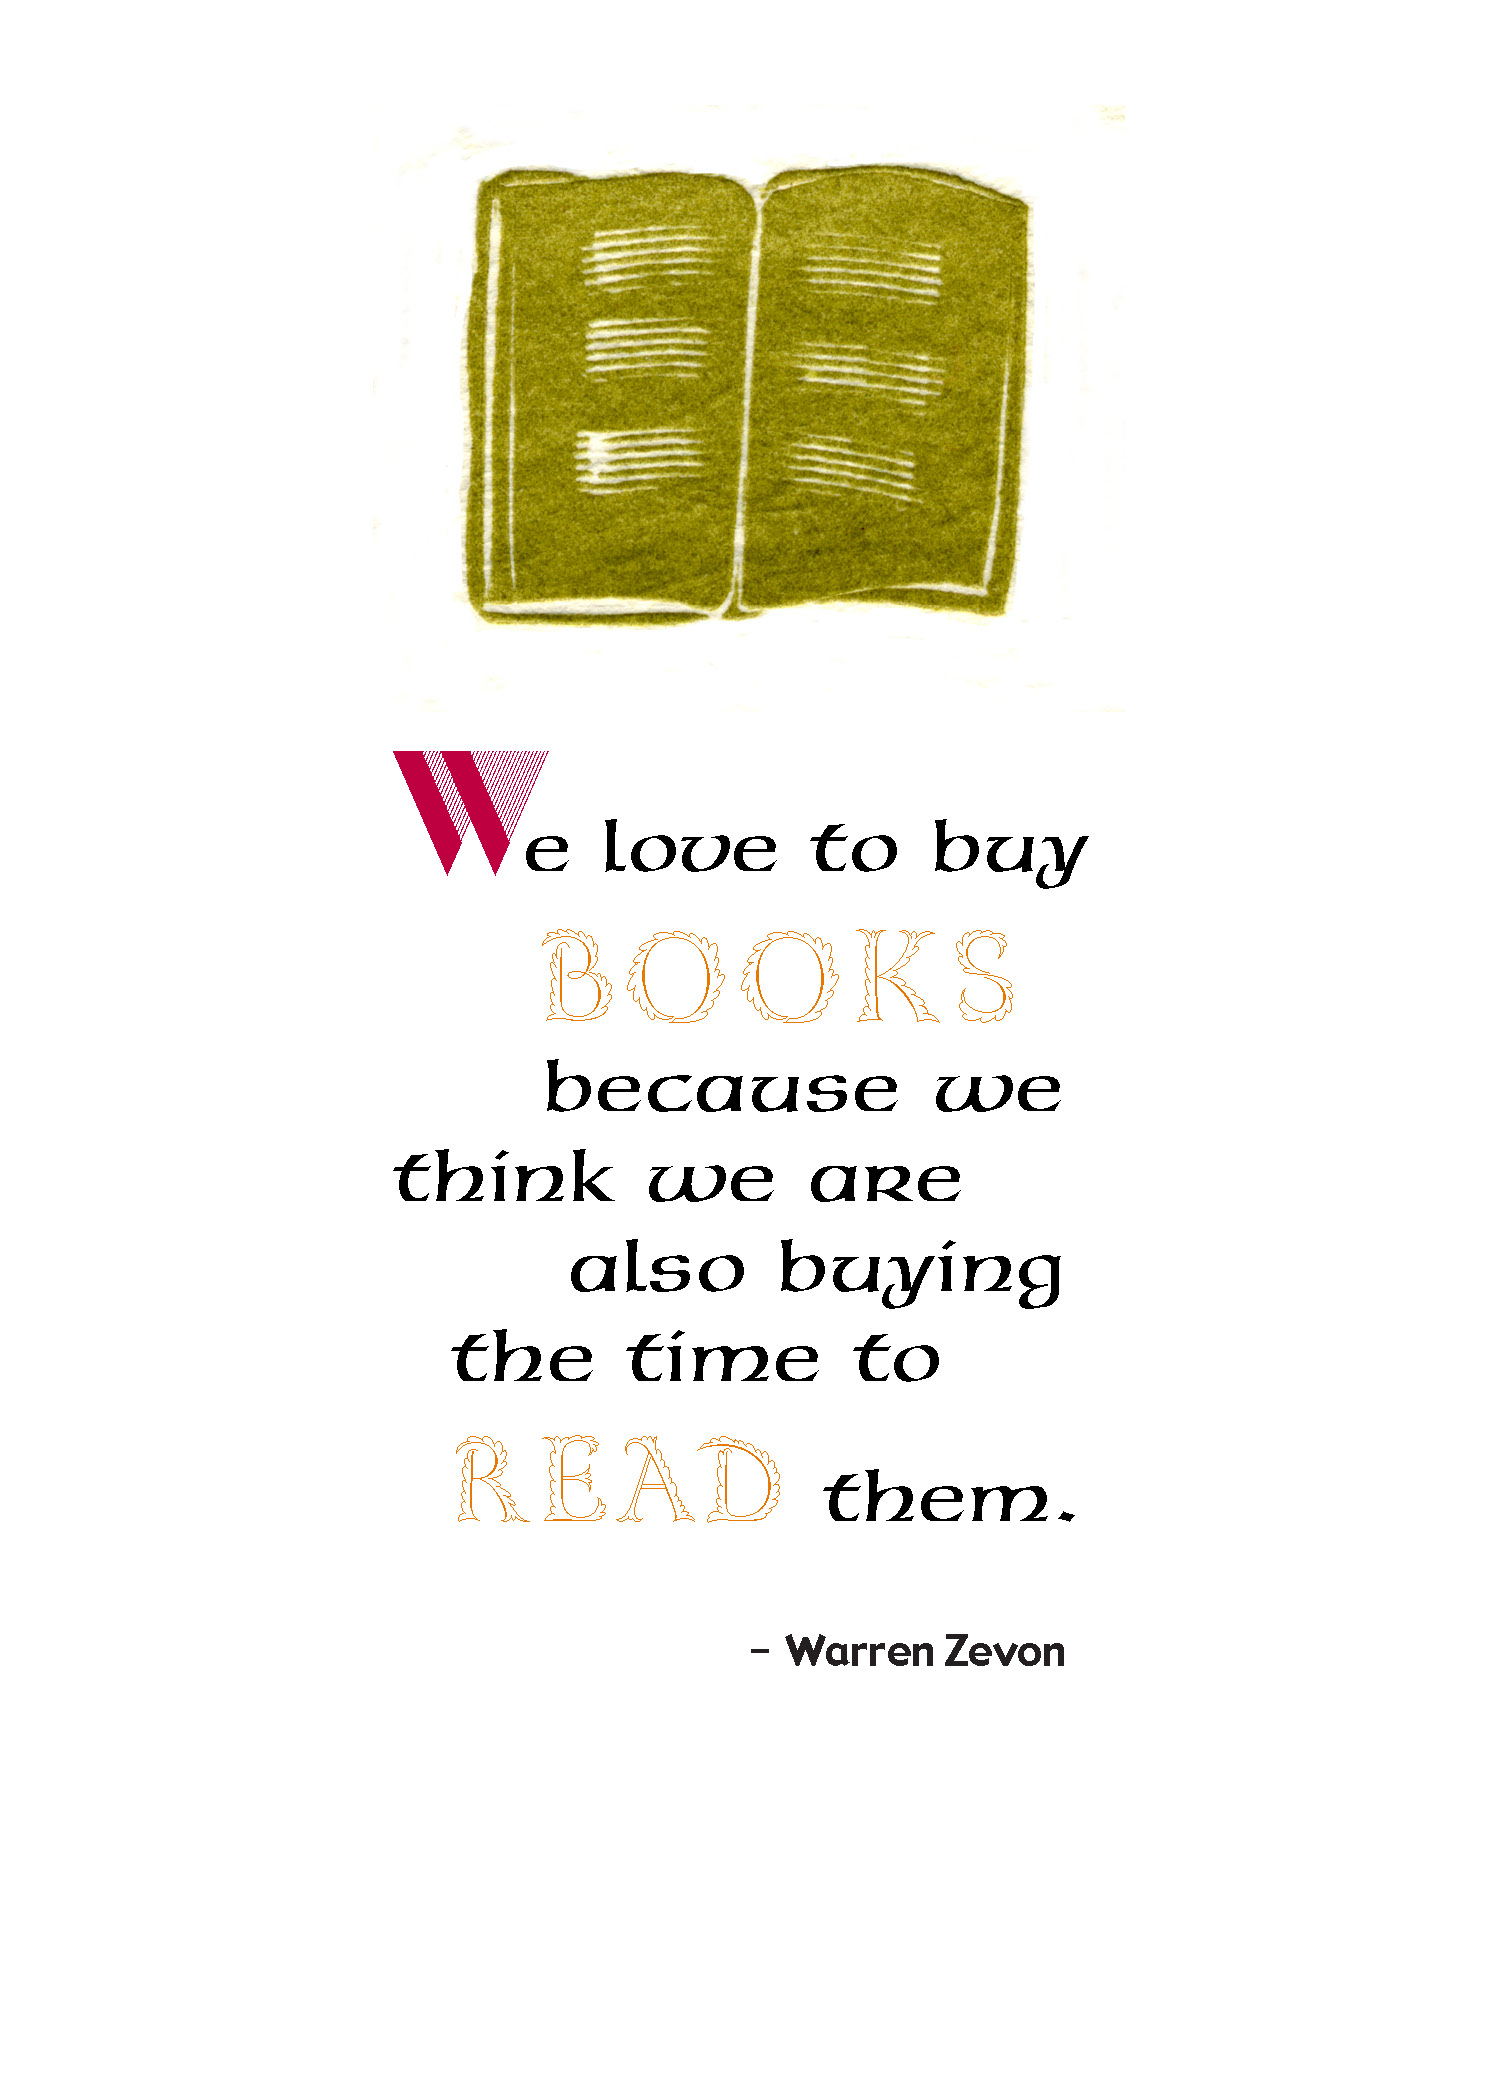 Zevon quote.jpg